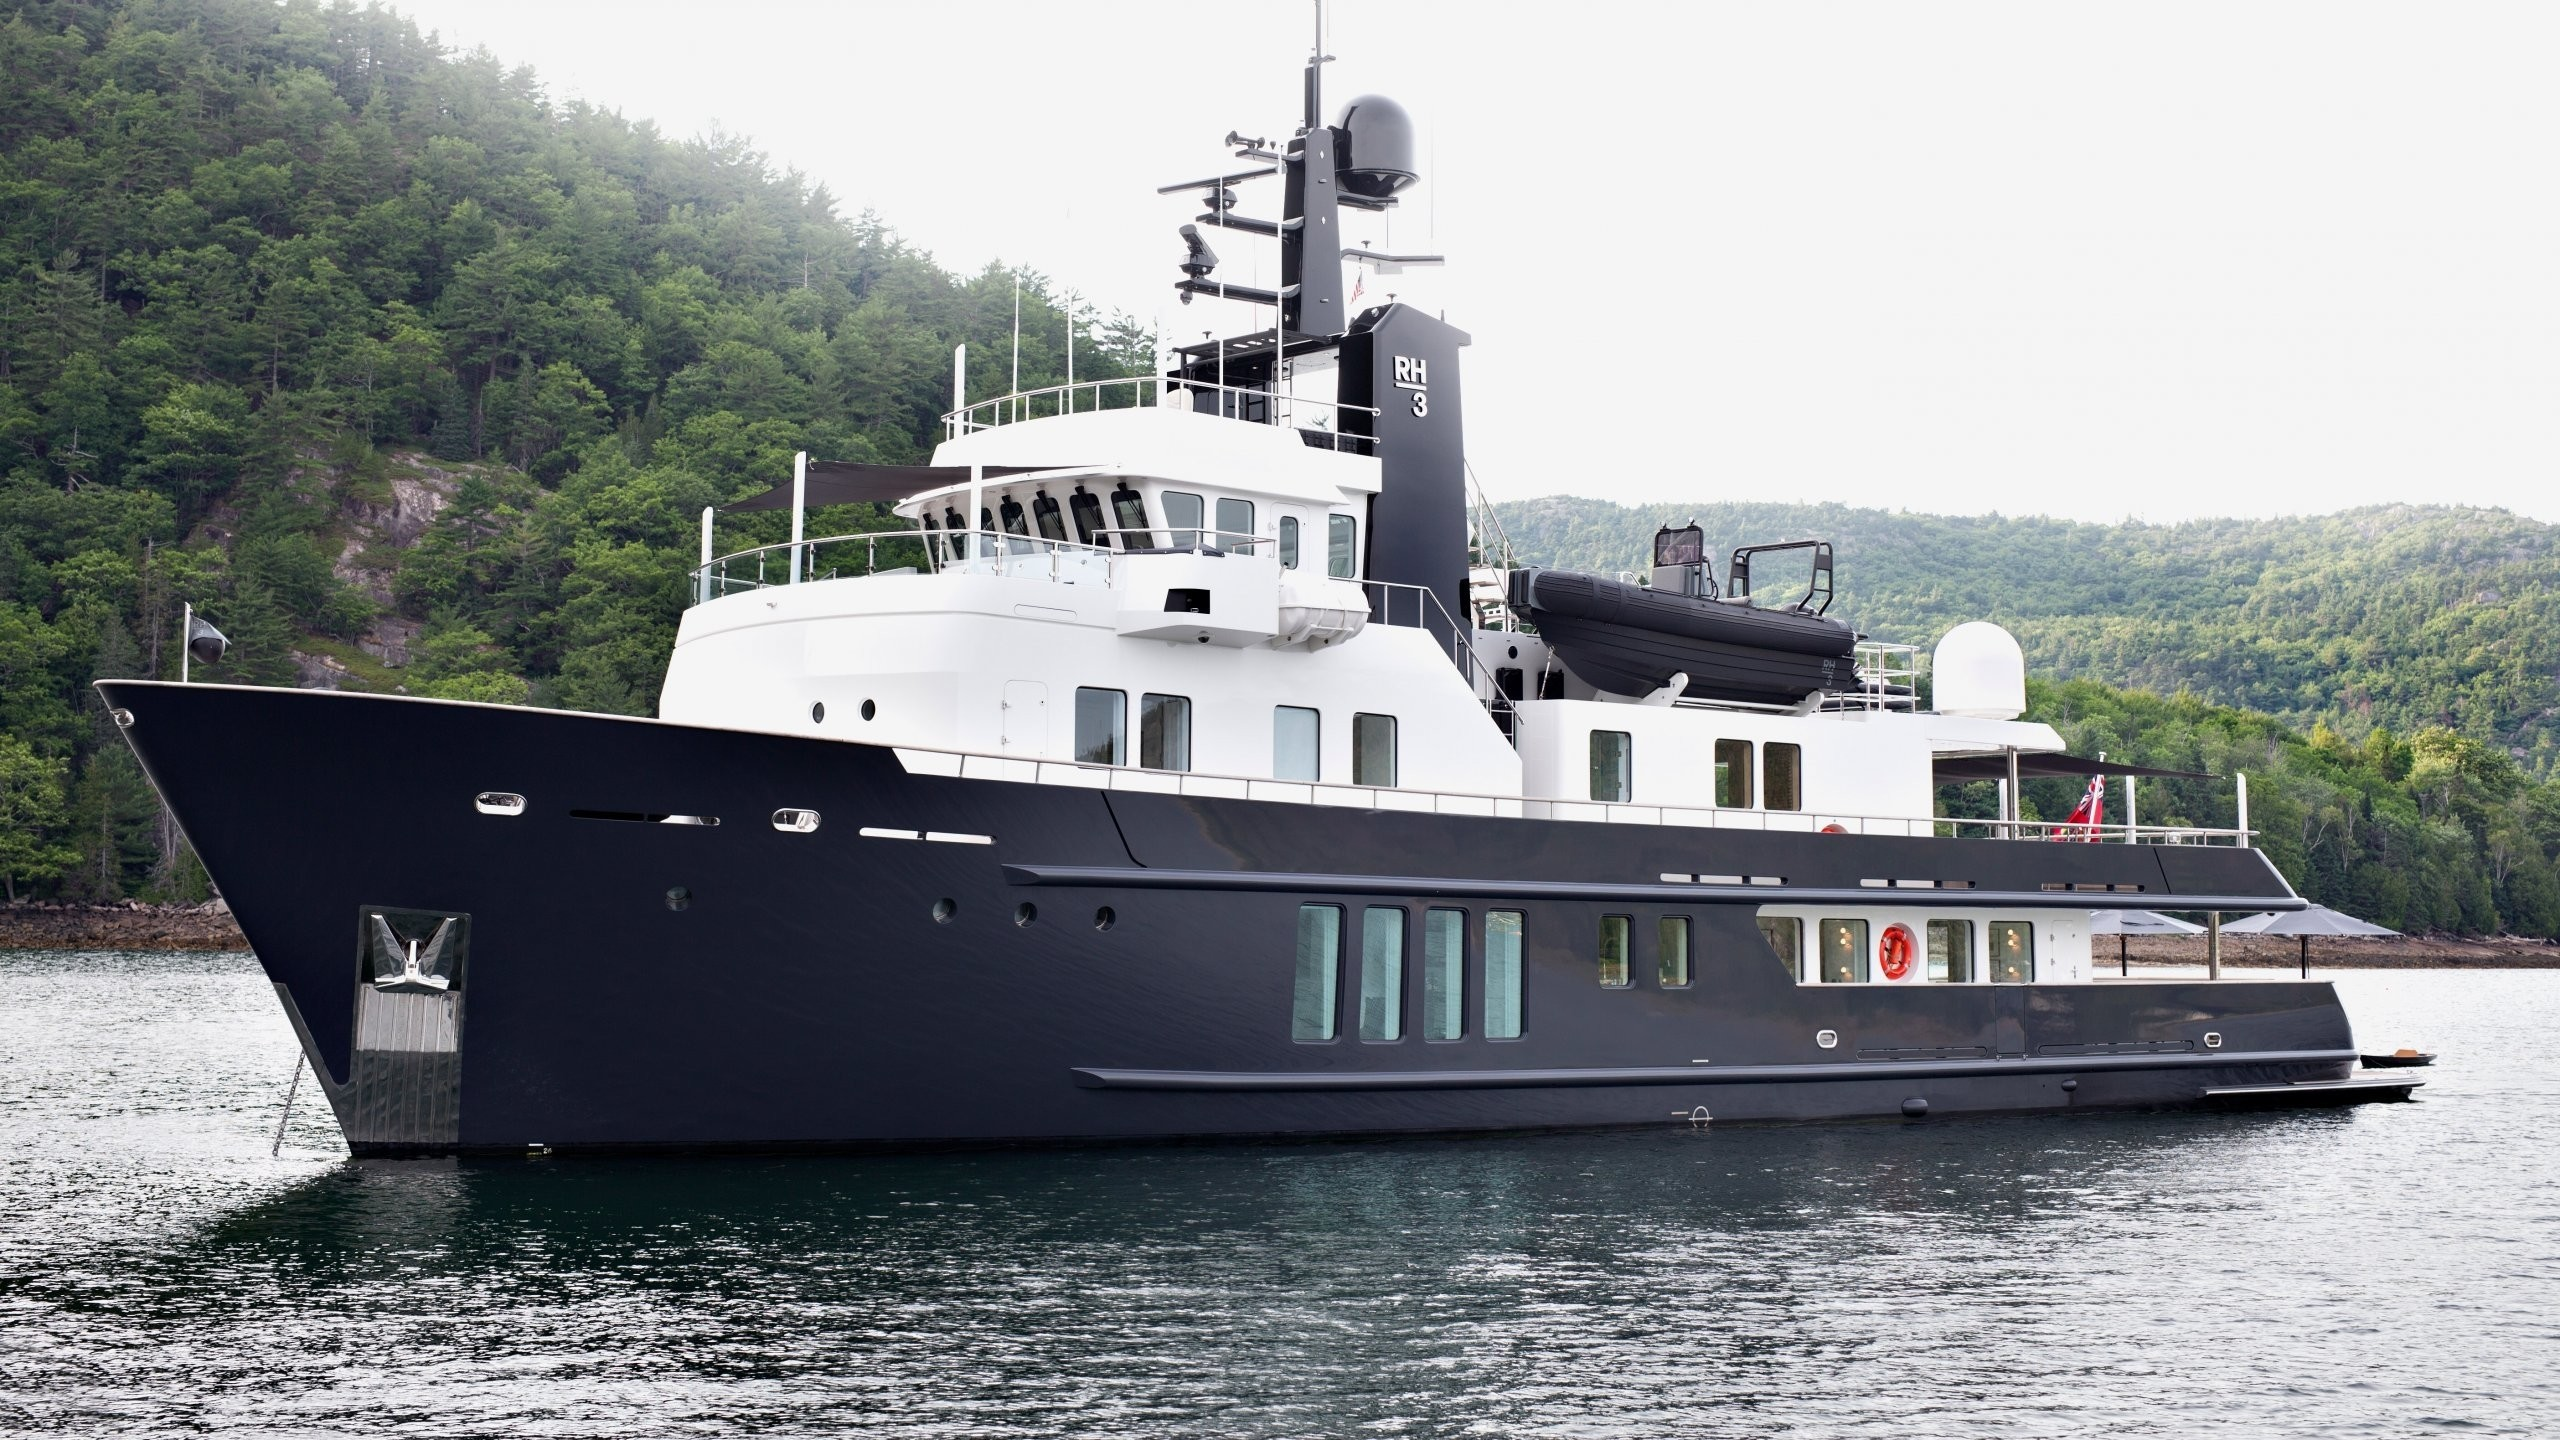 The 36m Yacht RH III